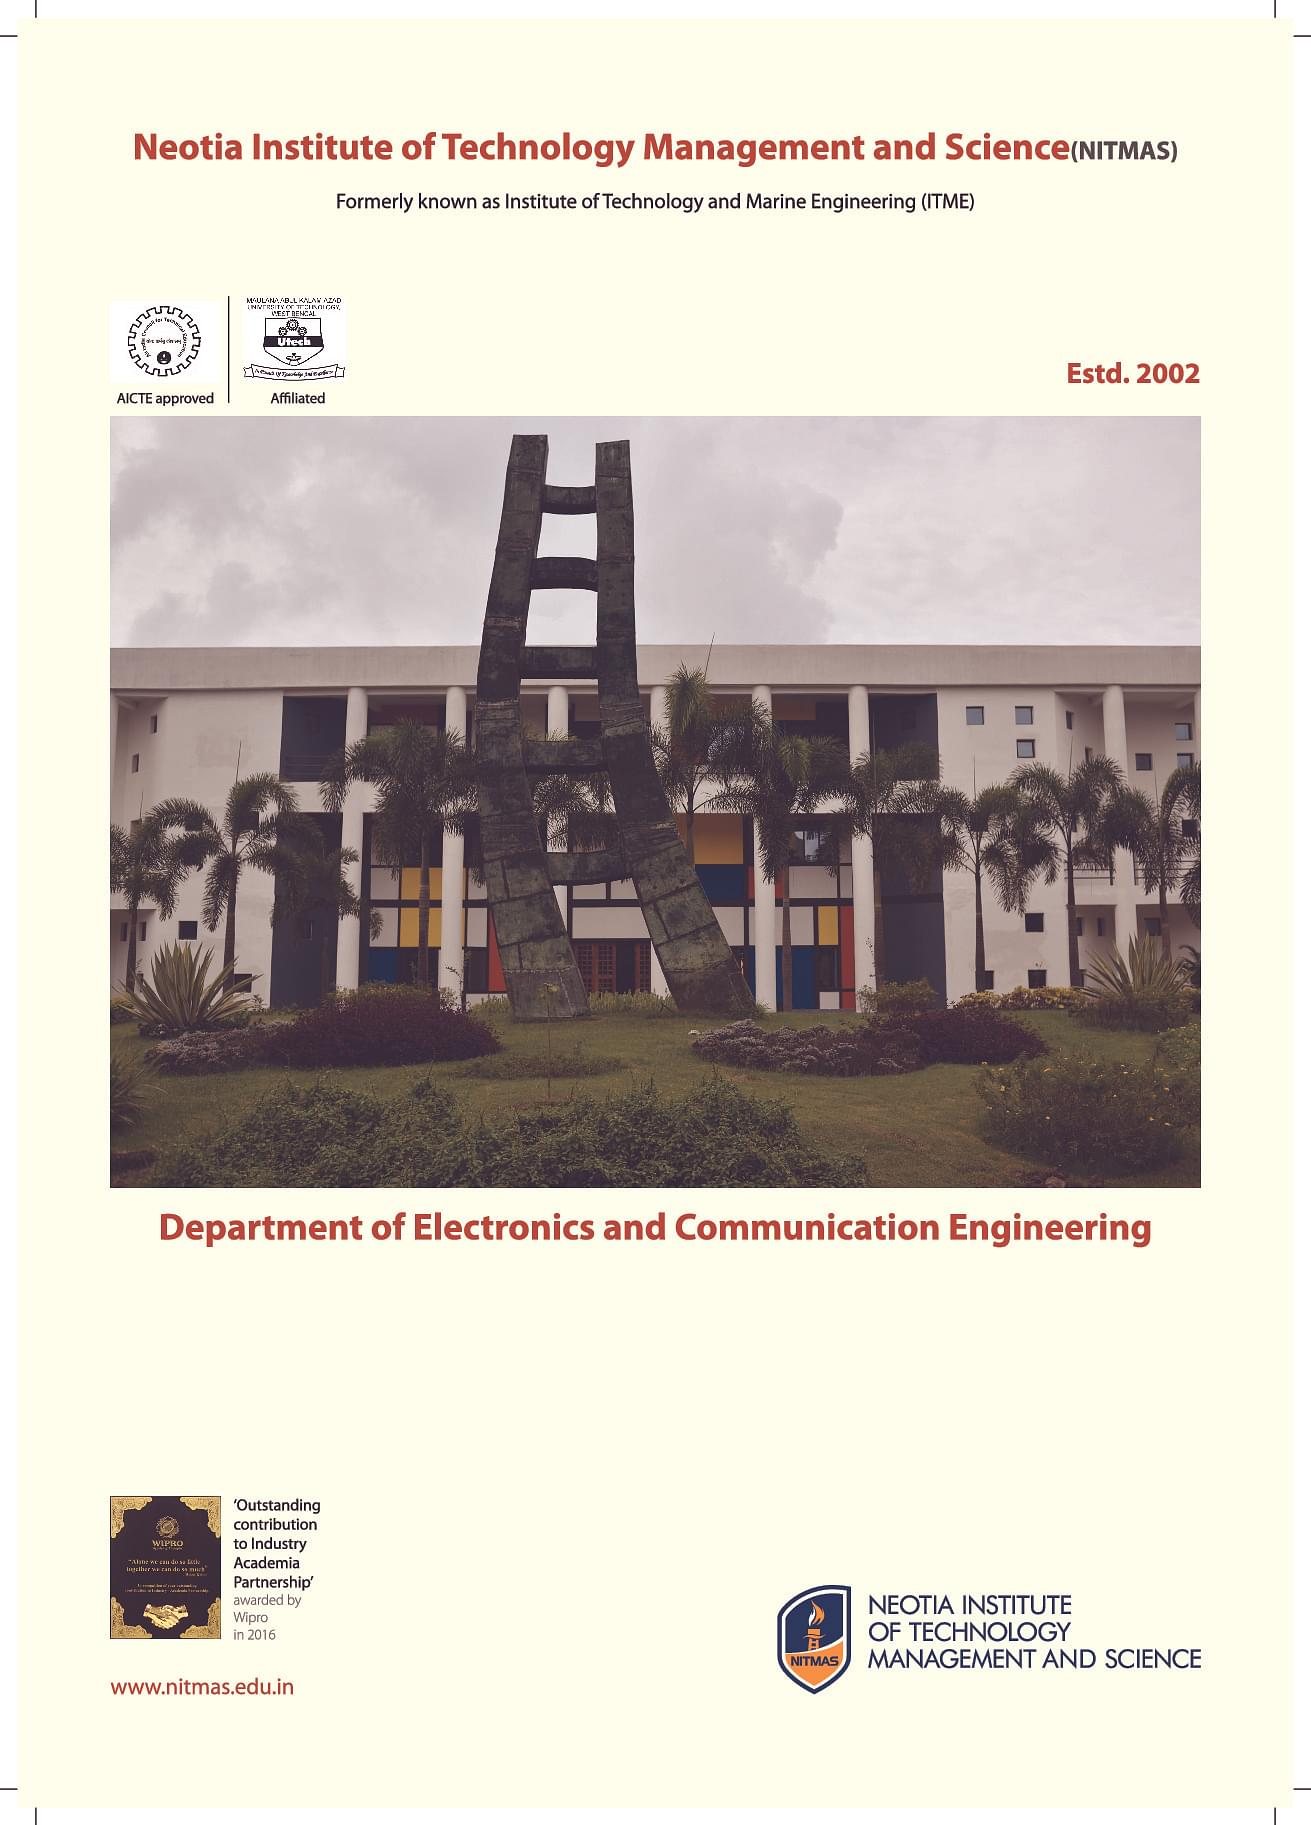 Technology Management Image: Neotia Institute Of Technology Management And Science